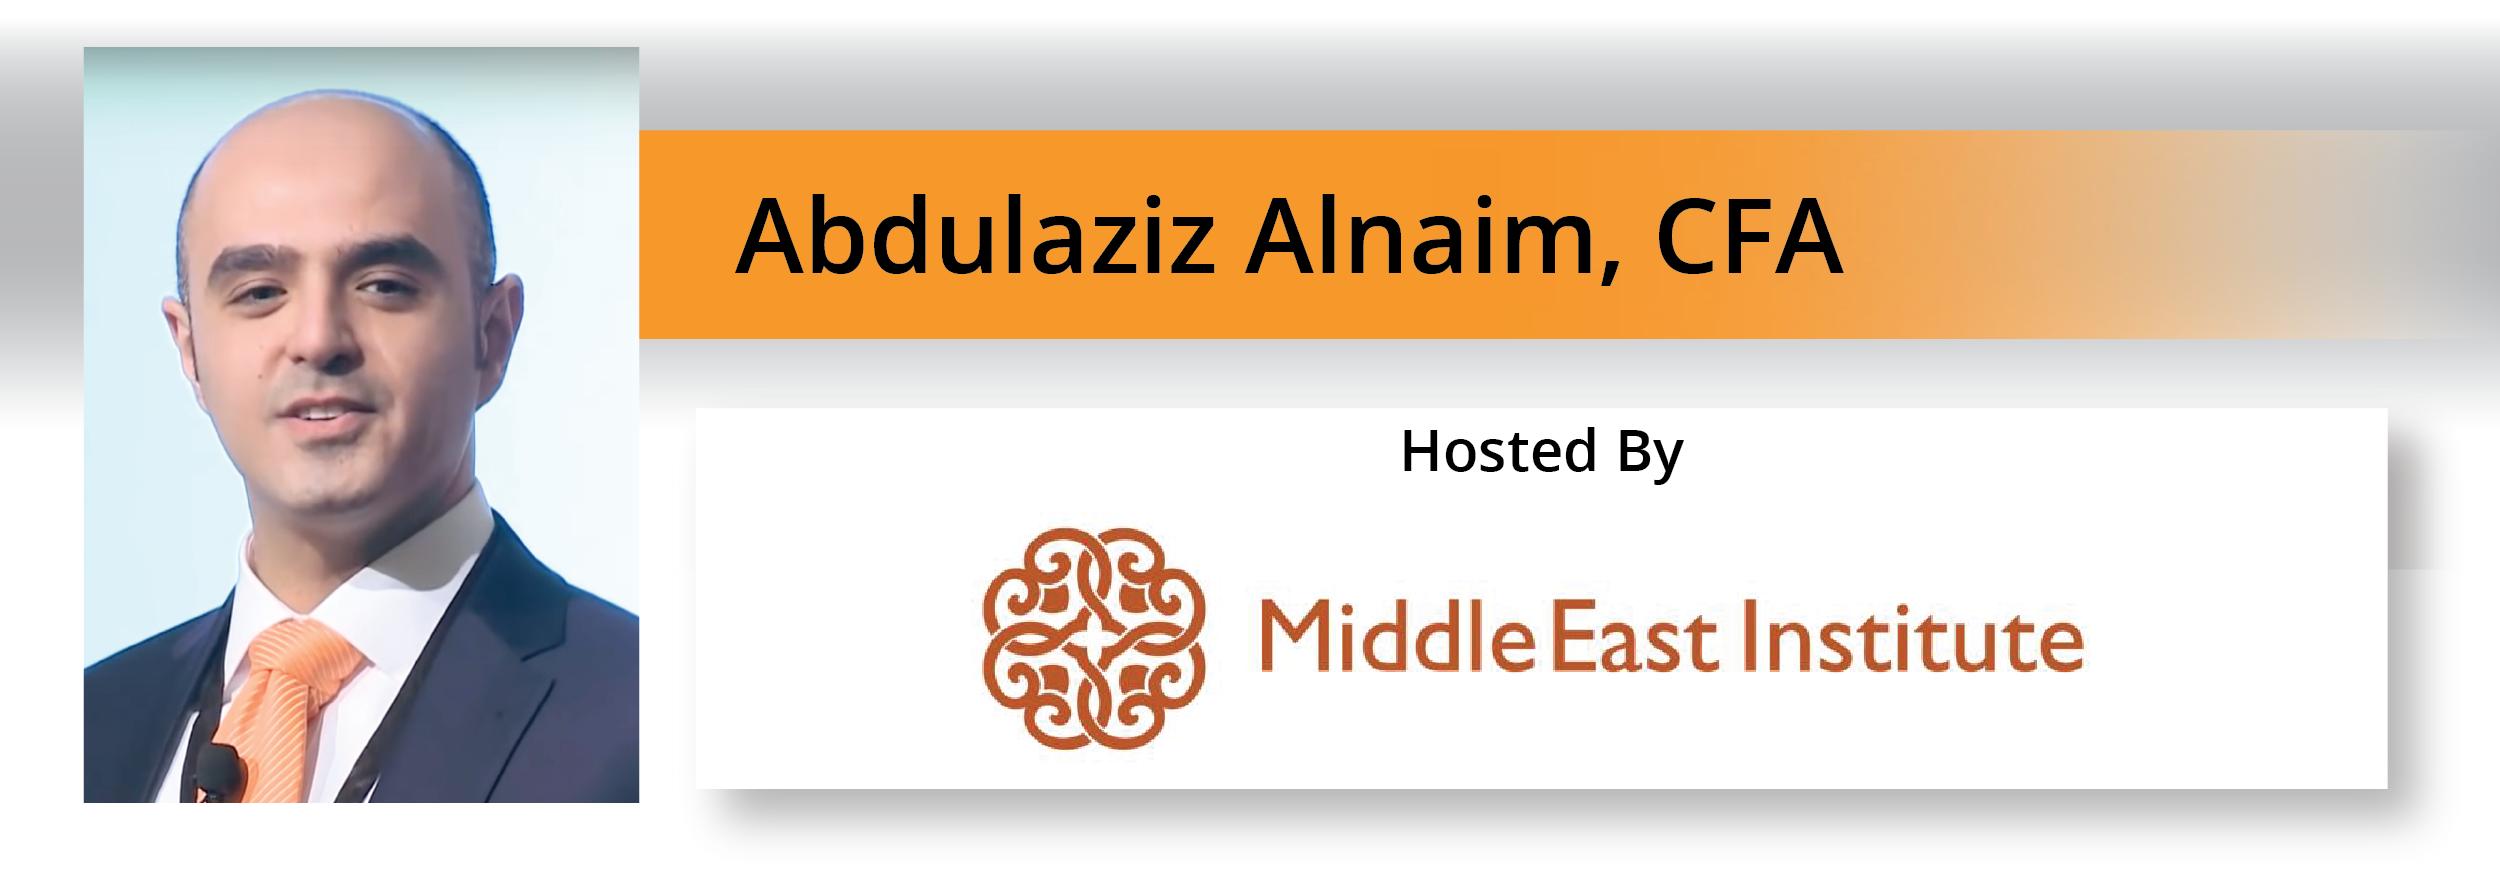 Abdulaziz Alnaim CFA-06